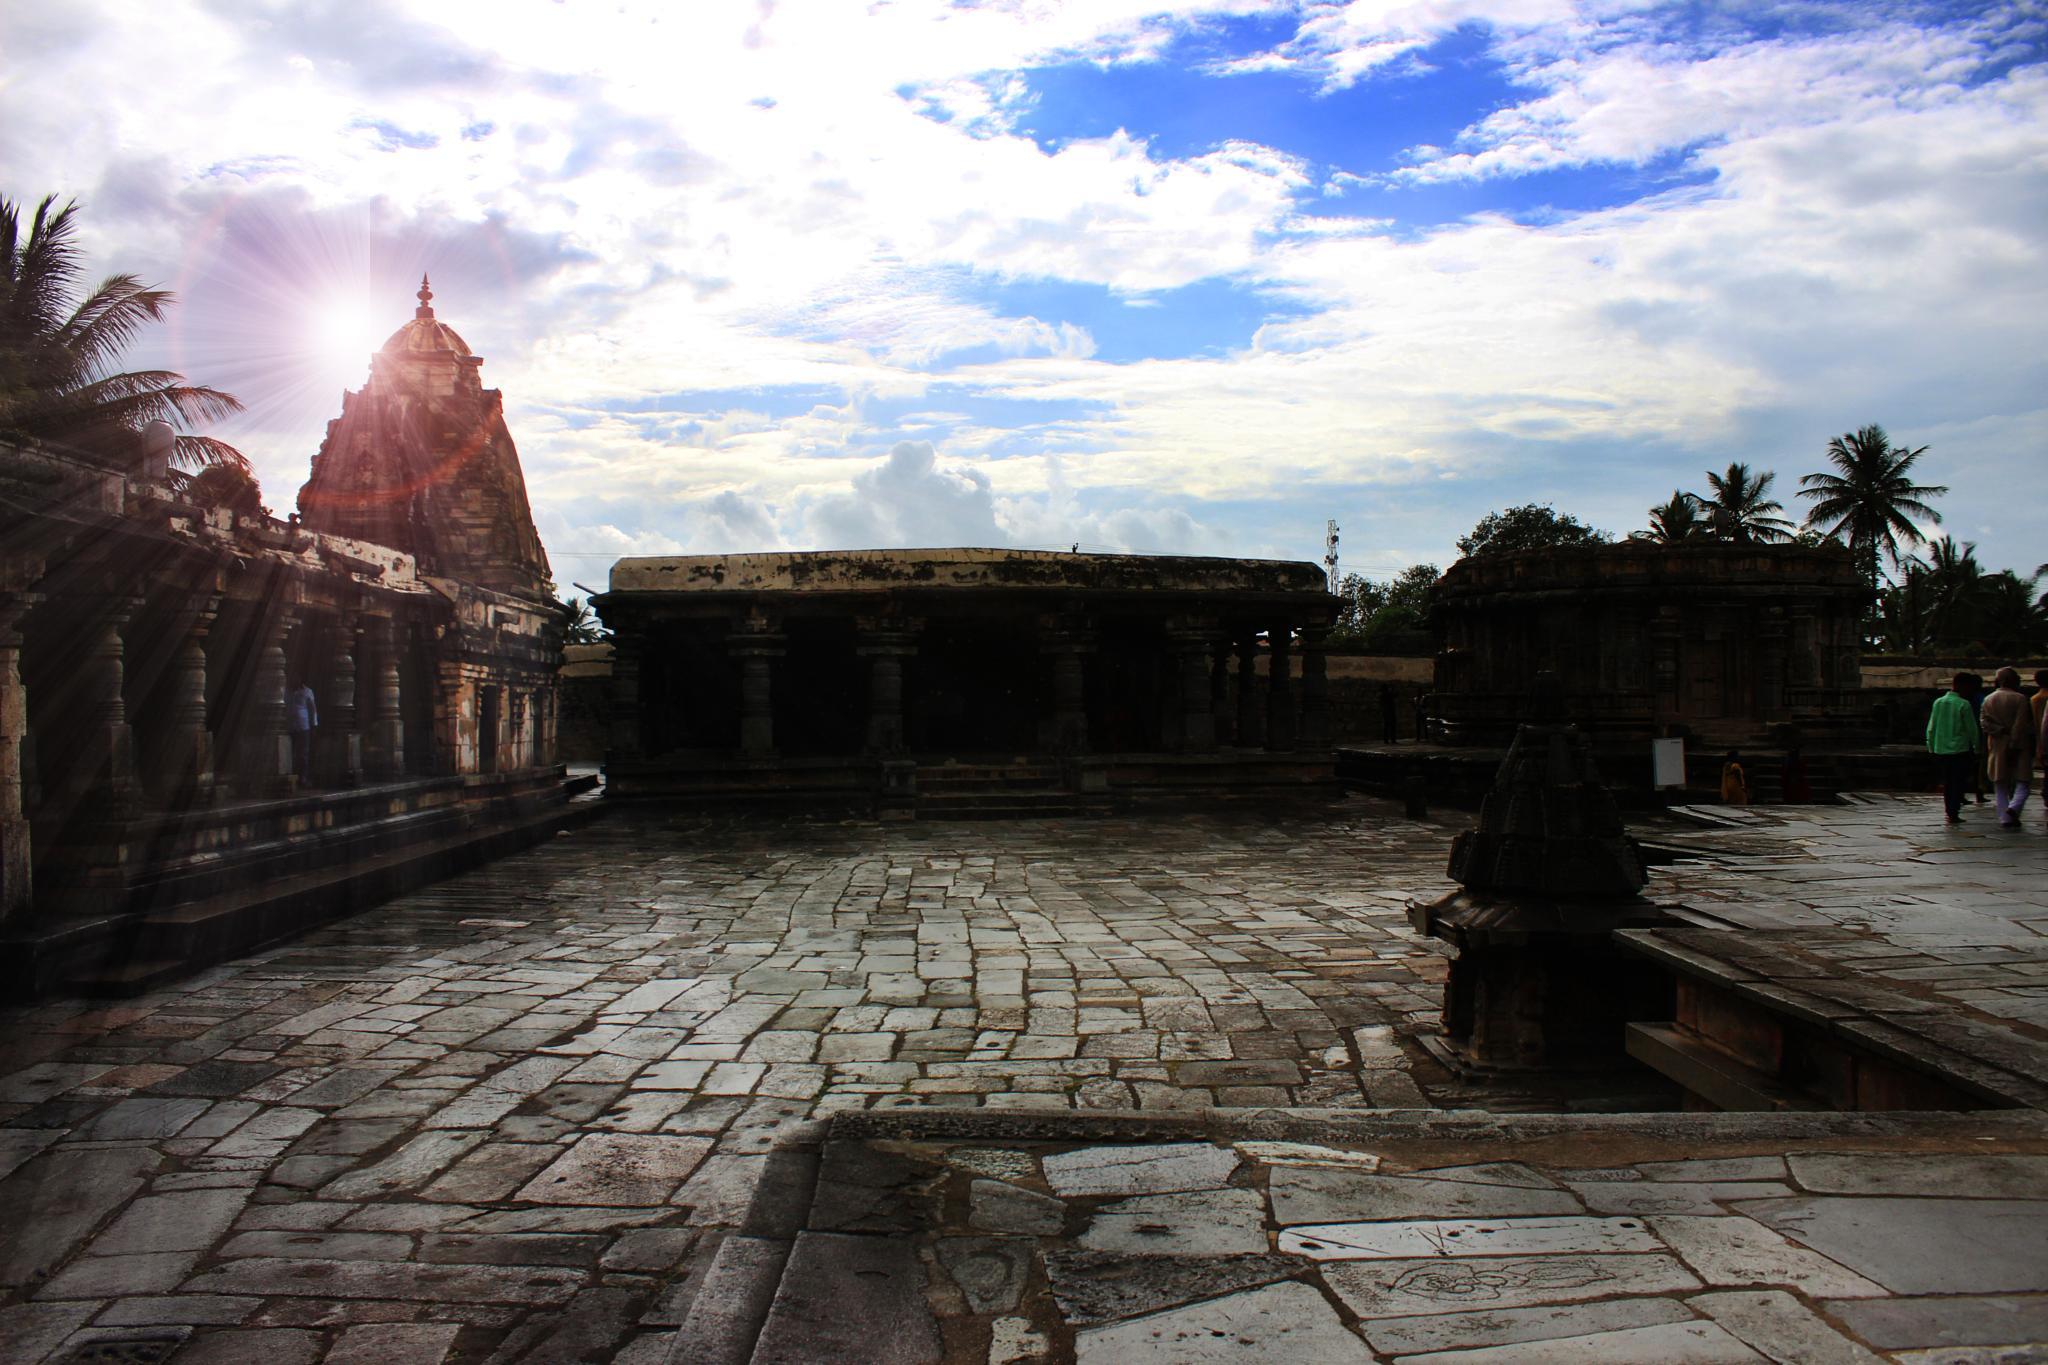 halebid temple by bharath kumar